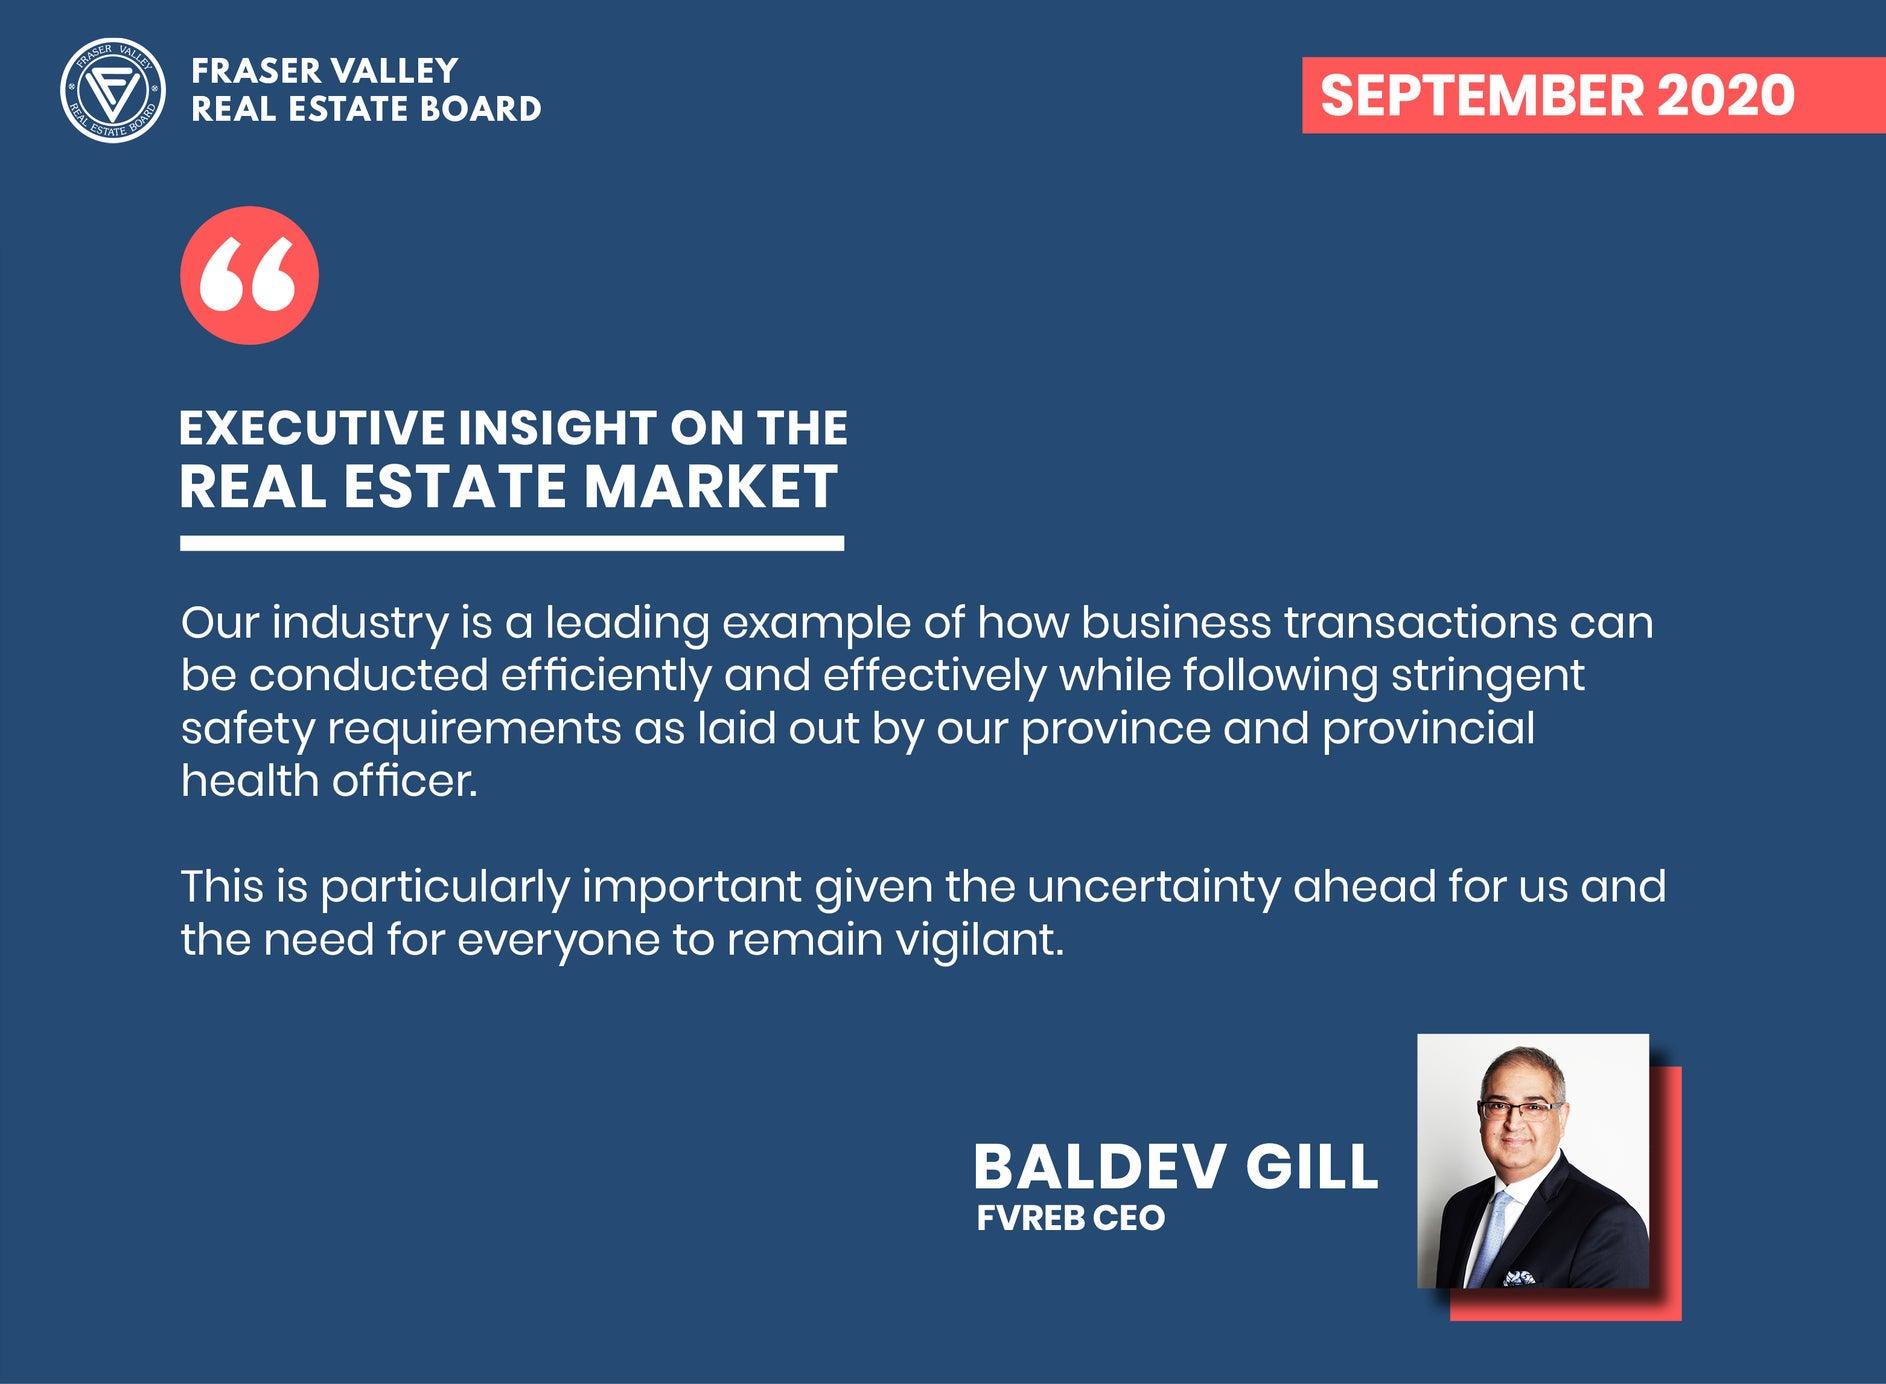 Fraser Valley Housing Market Report September 2020 – Executive Insight